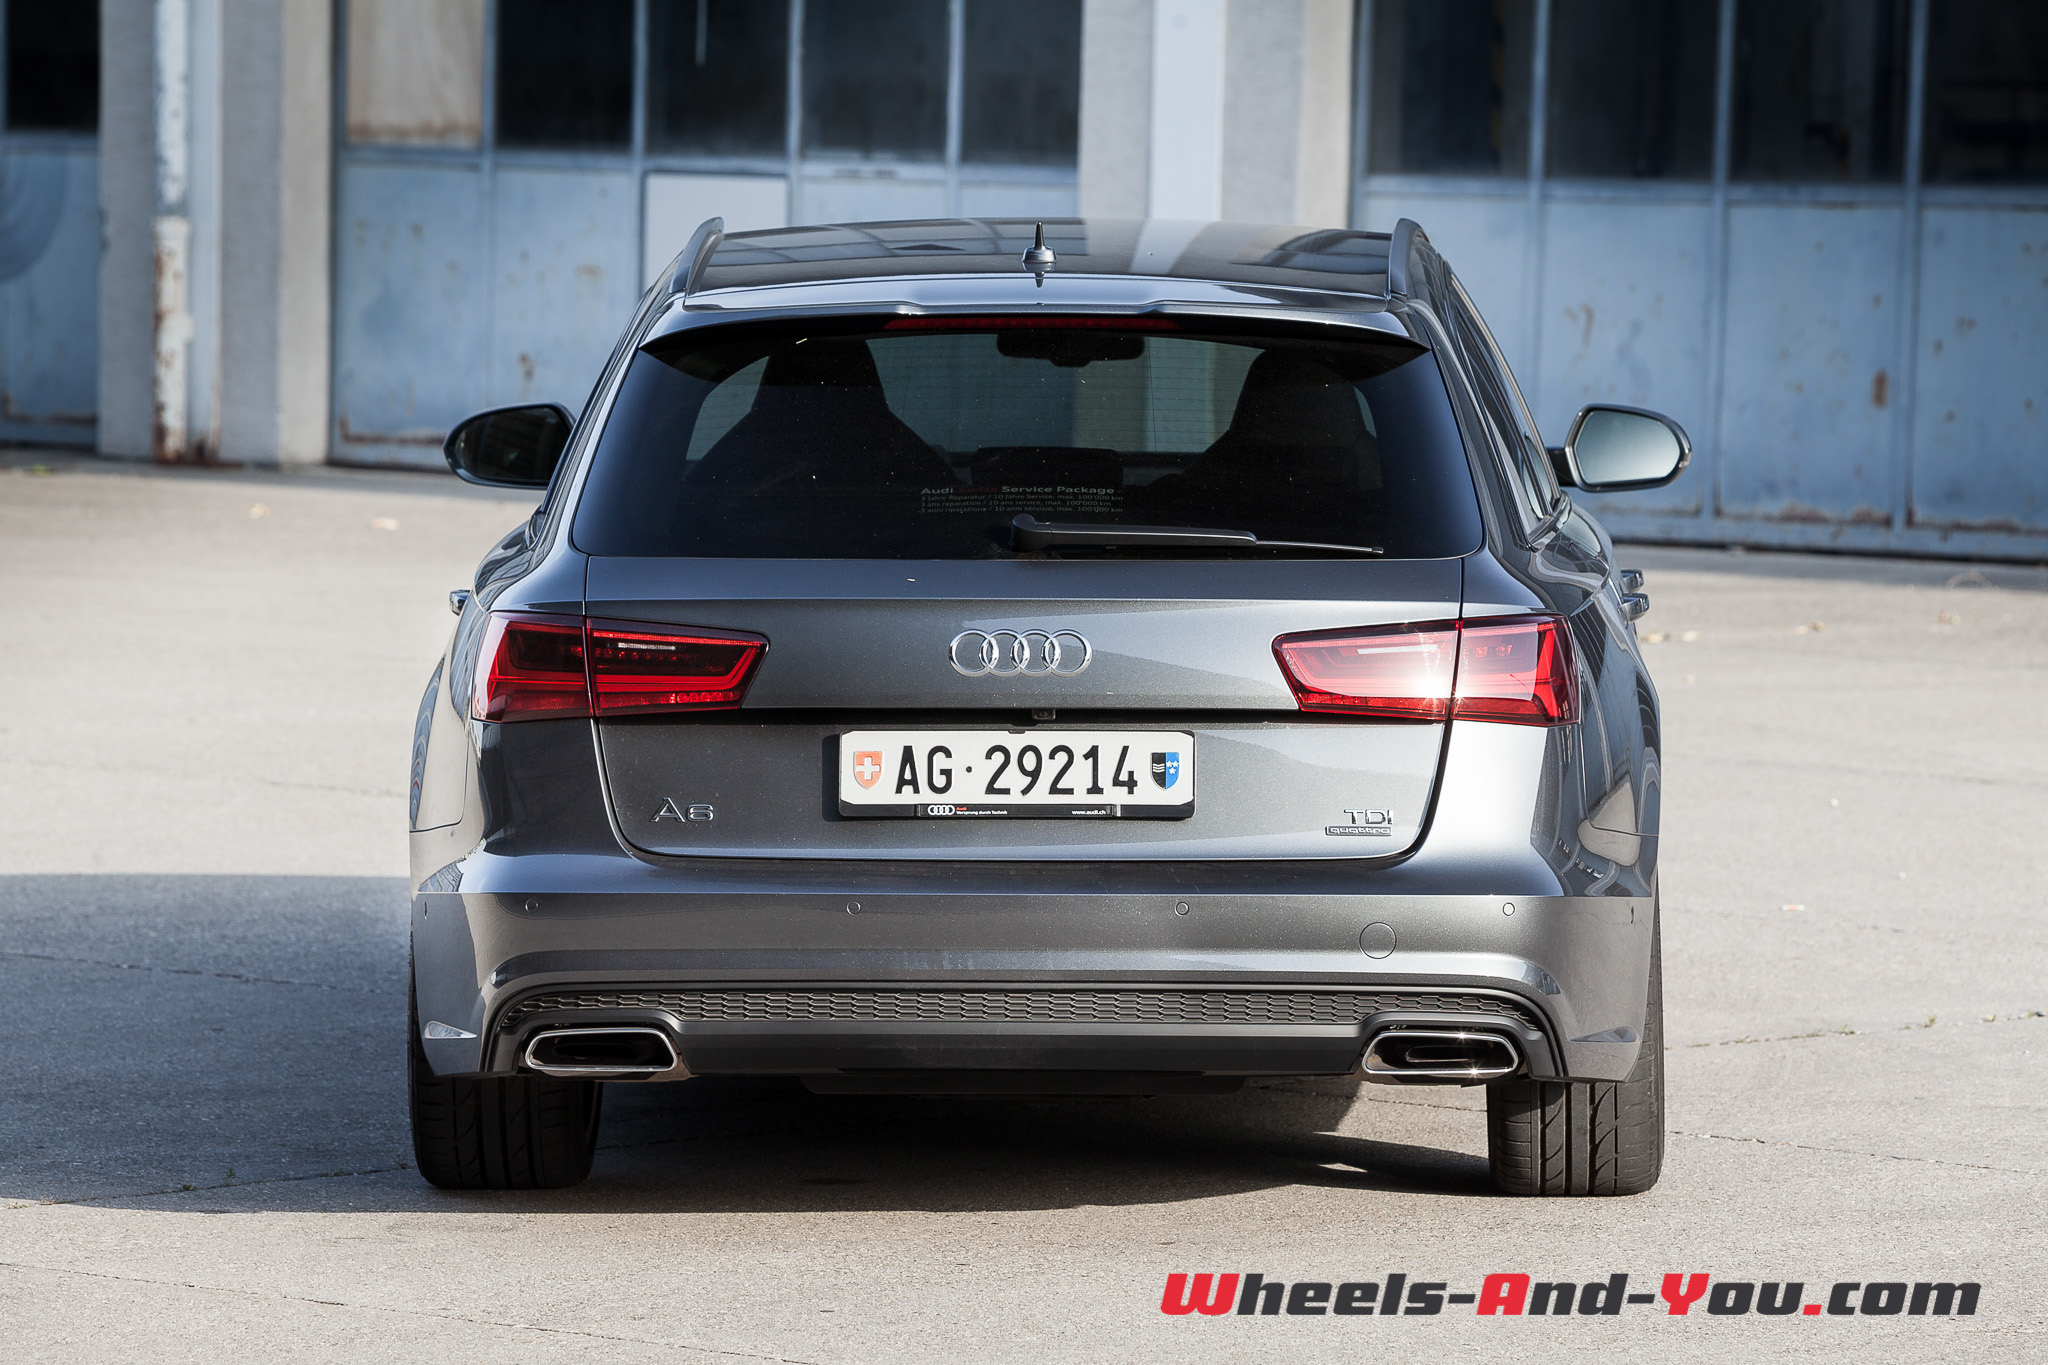 Audi A6-23